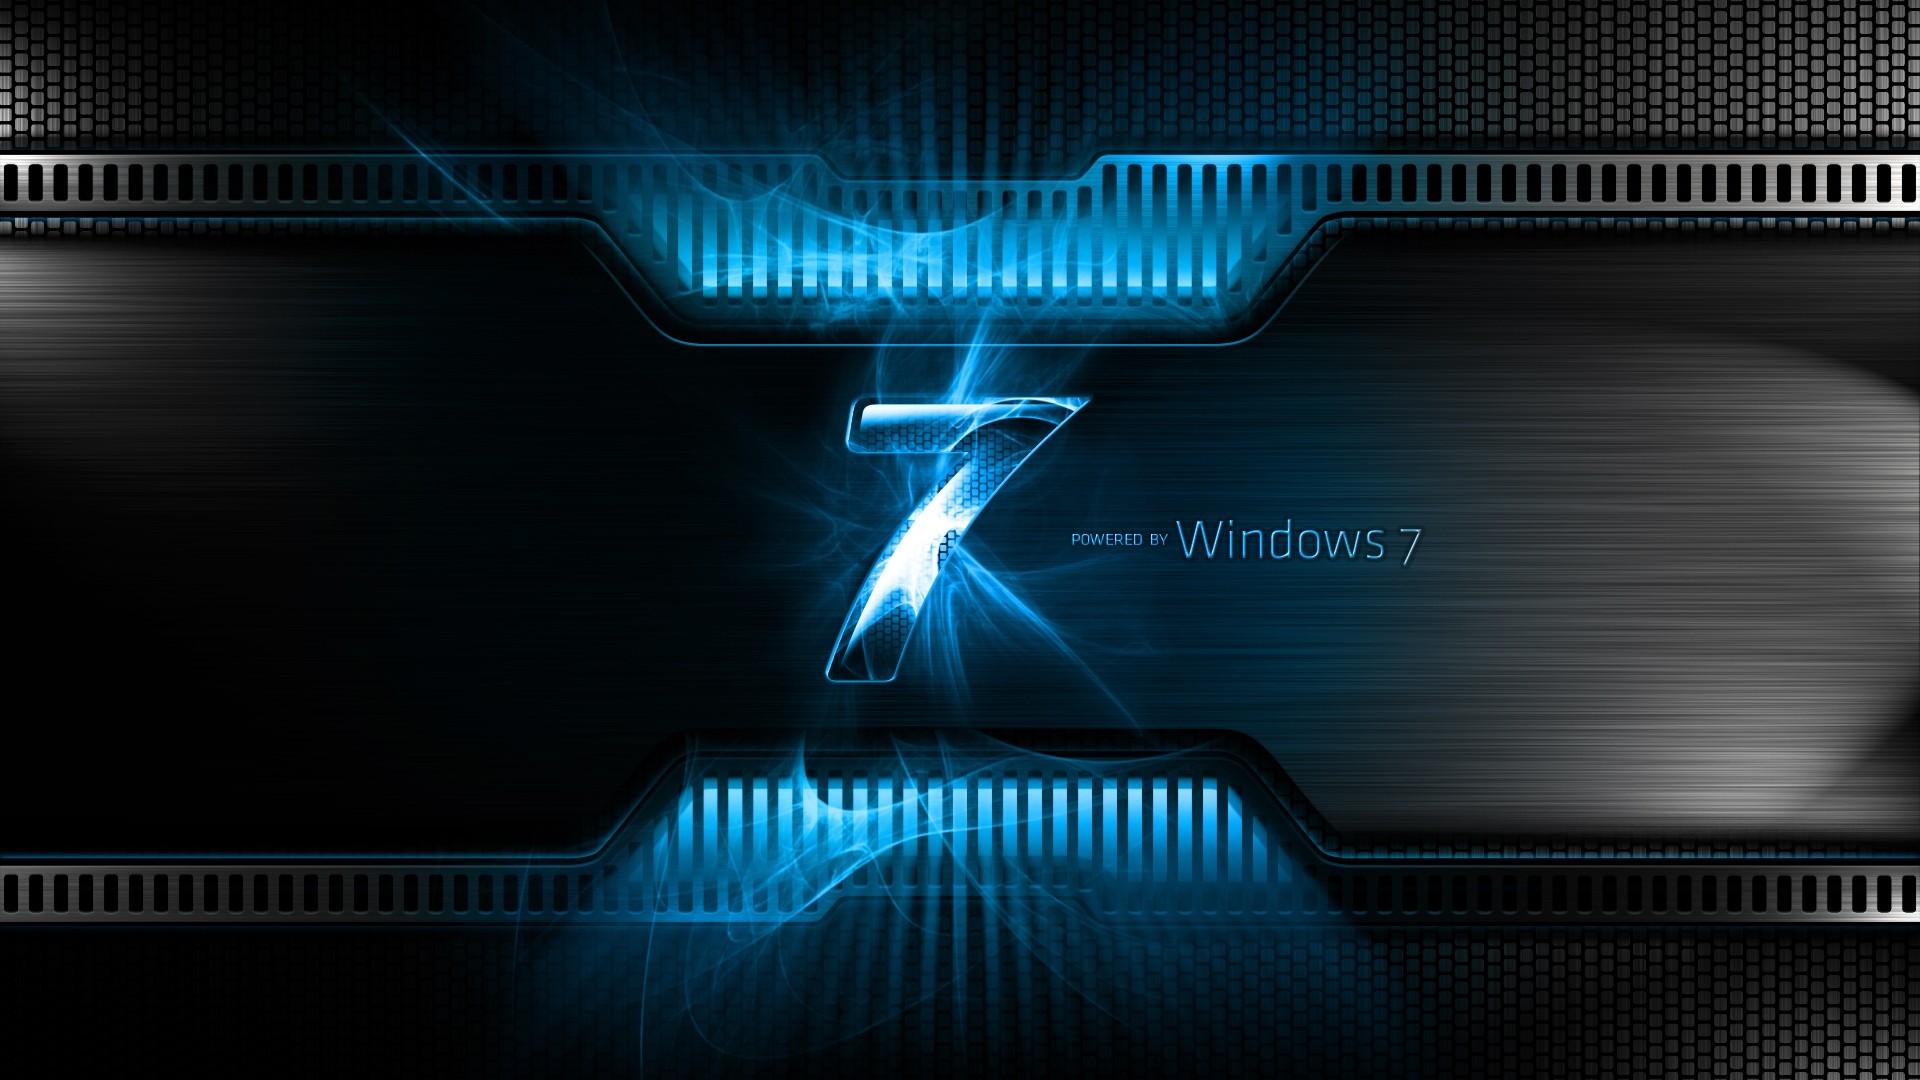 Wallpaper windows 7, blue, black, logo, light